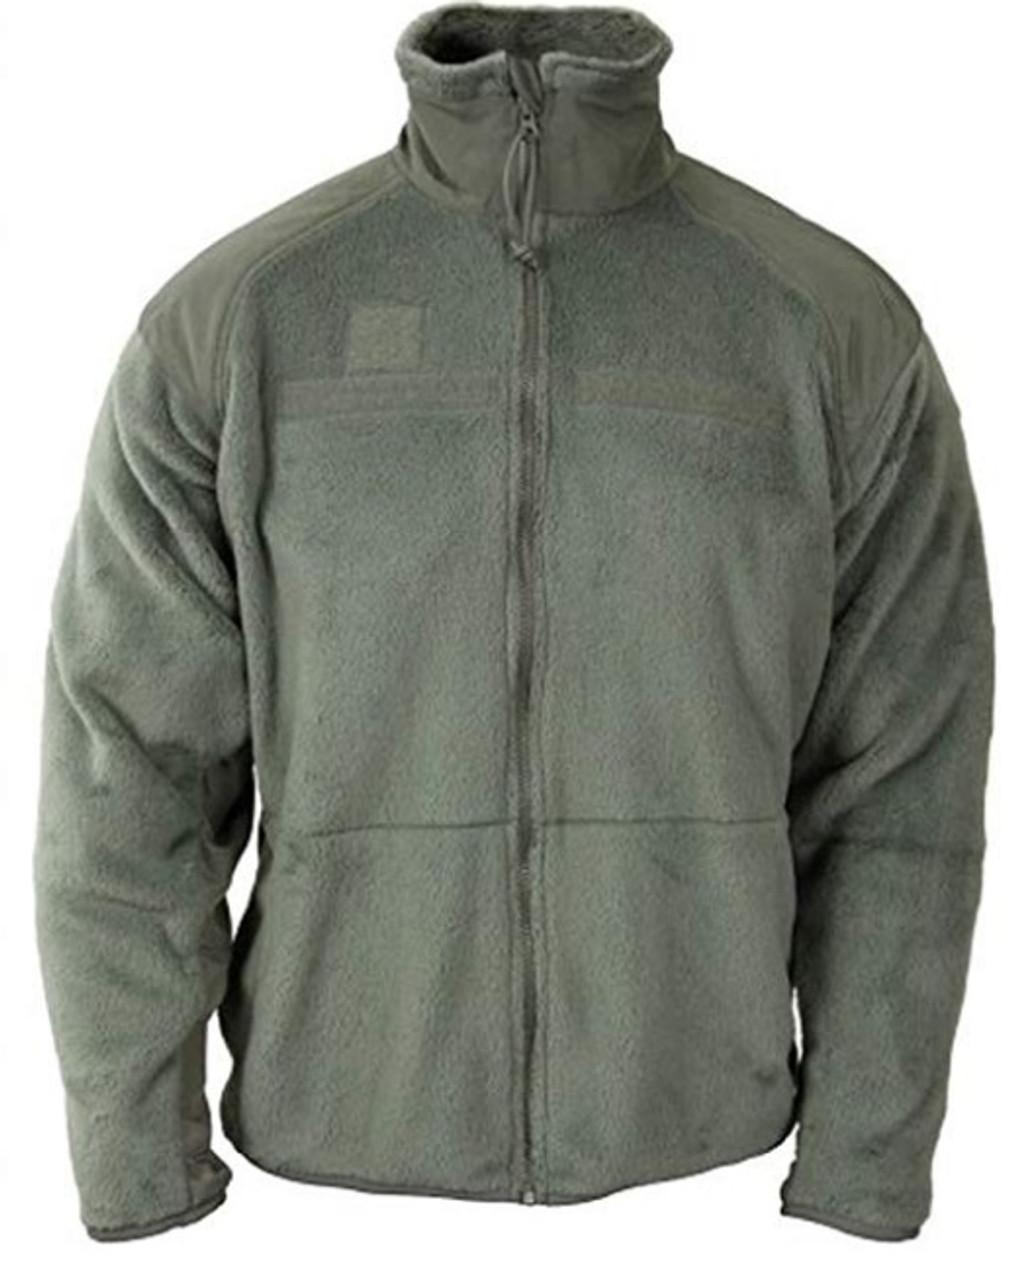 US Military Issue GEN III Polartec Fleece Jacket Foliage Green